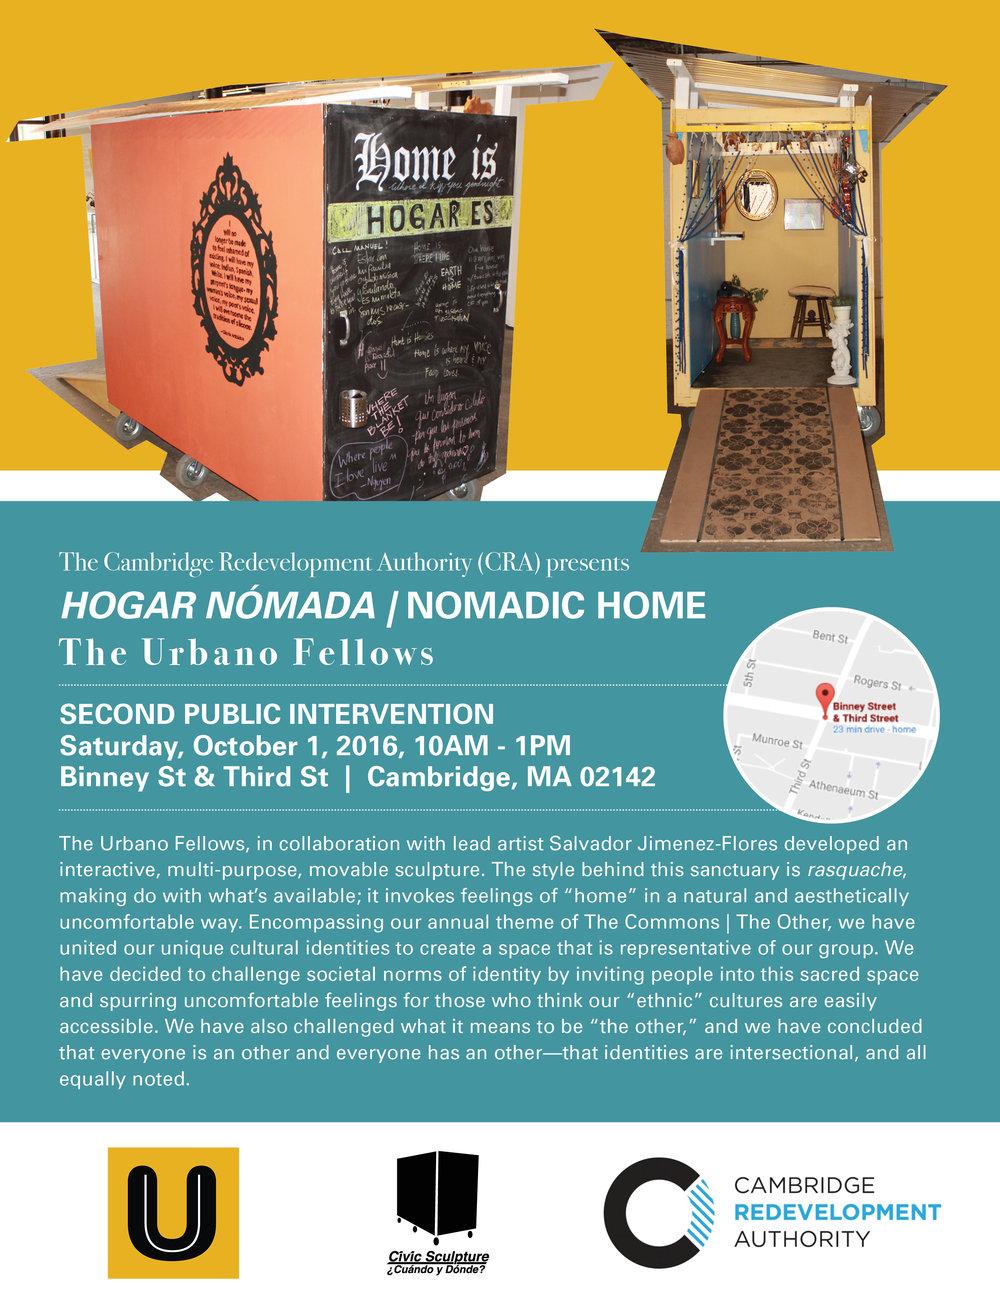 Hogar Nómada/Nomadic Home